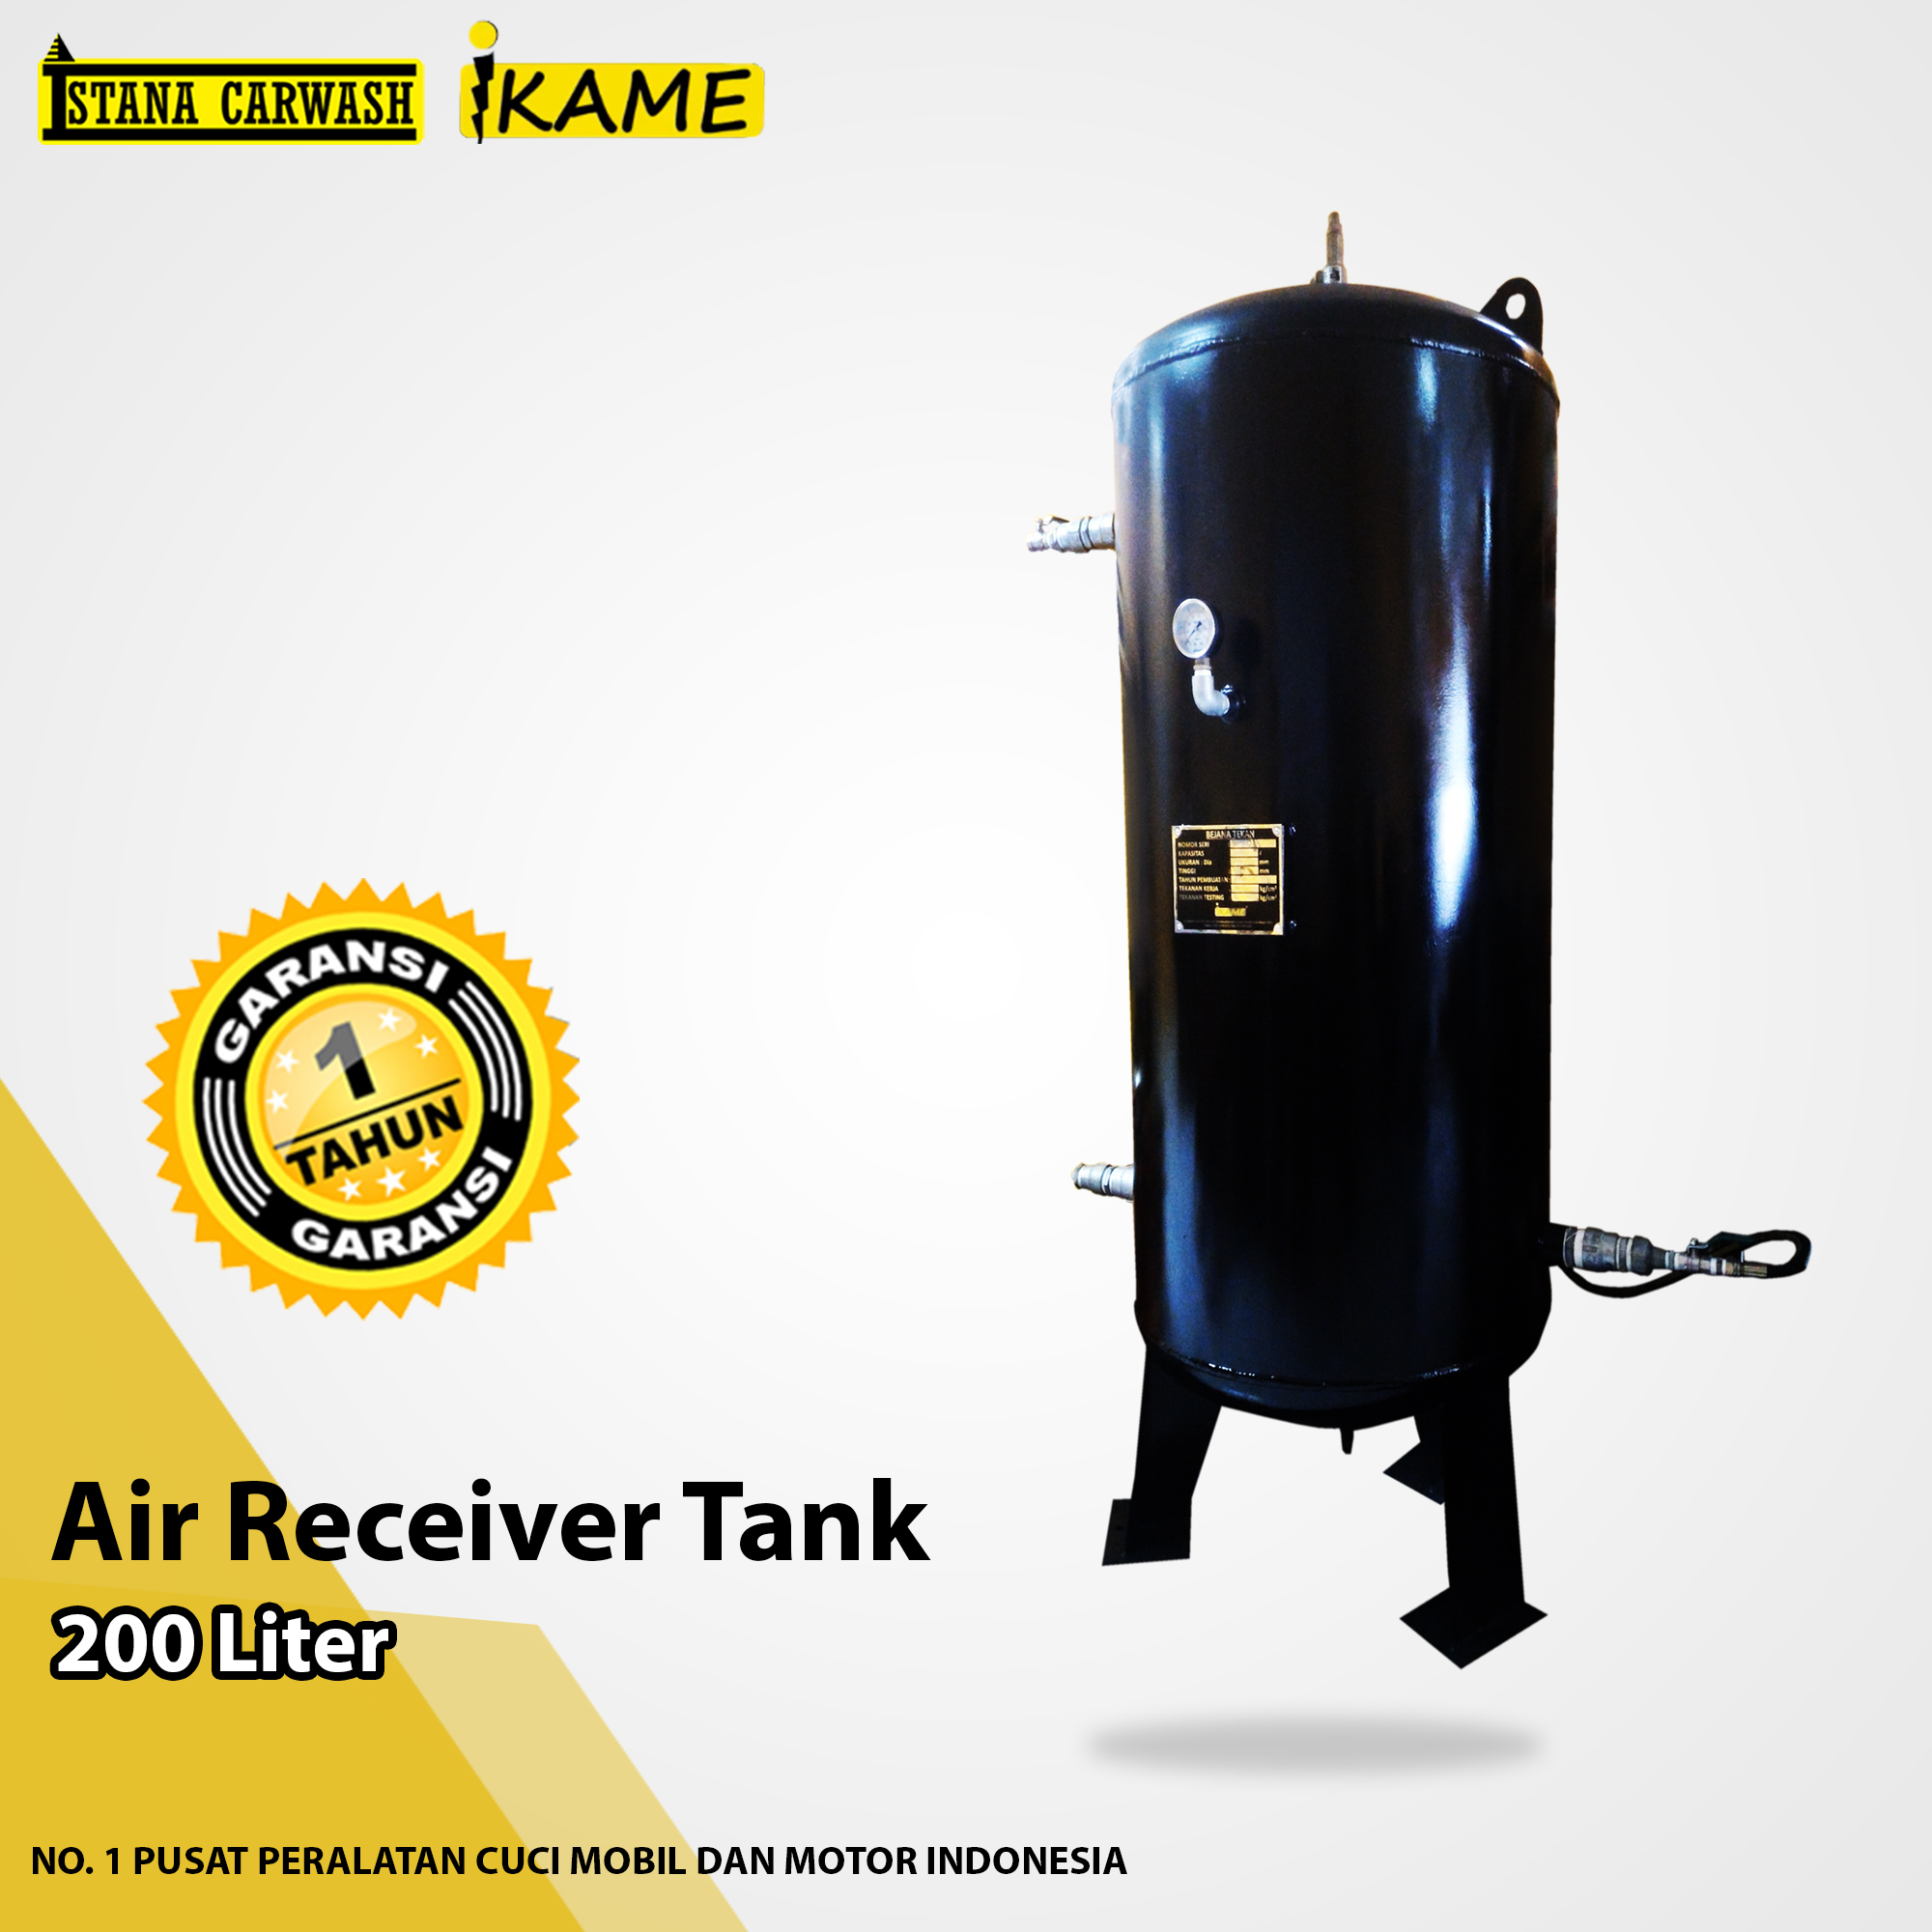 Air Receiver Tank 200 Liter